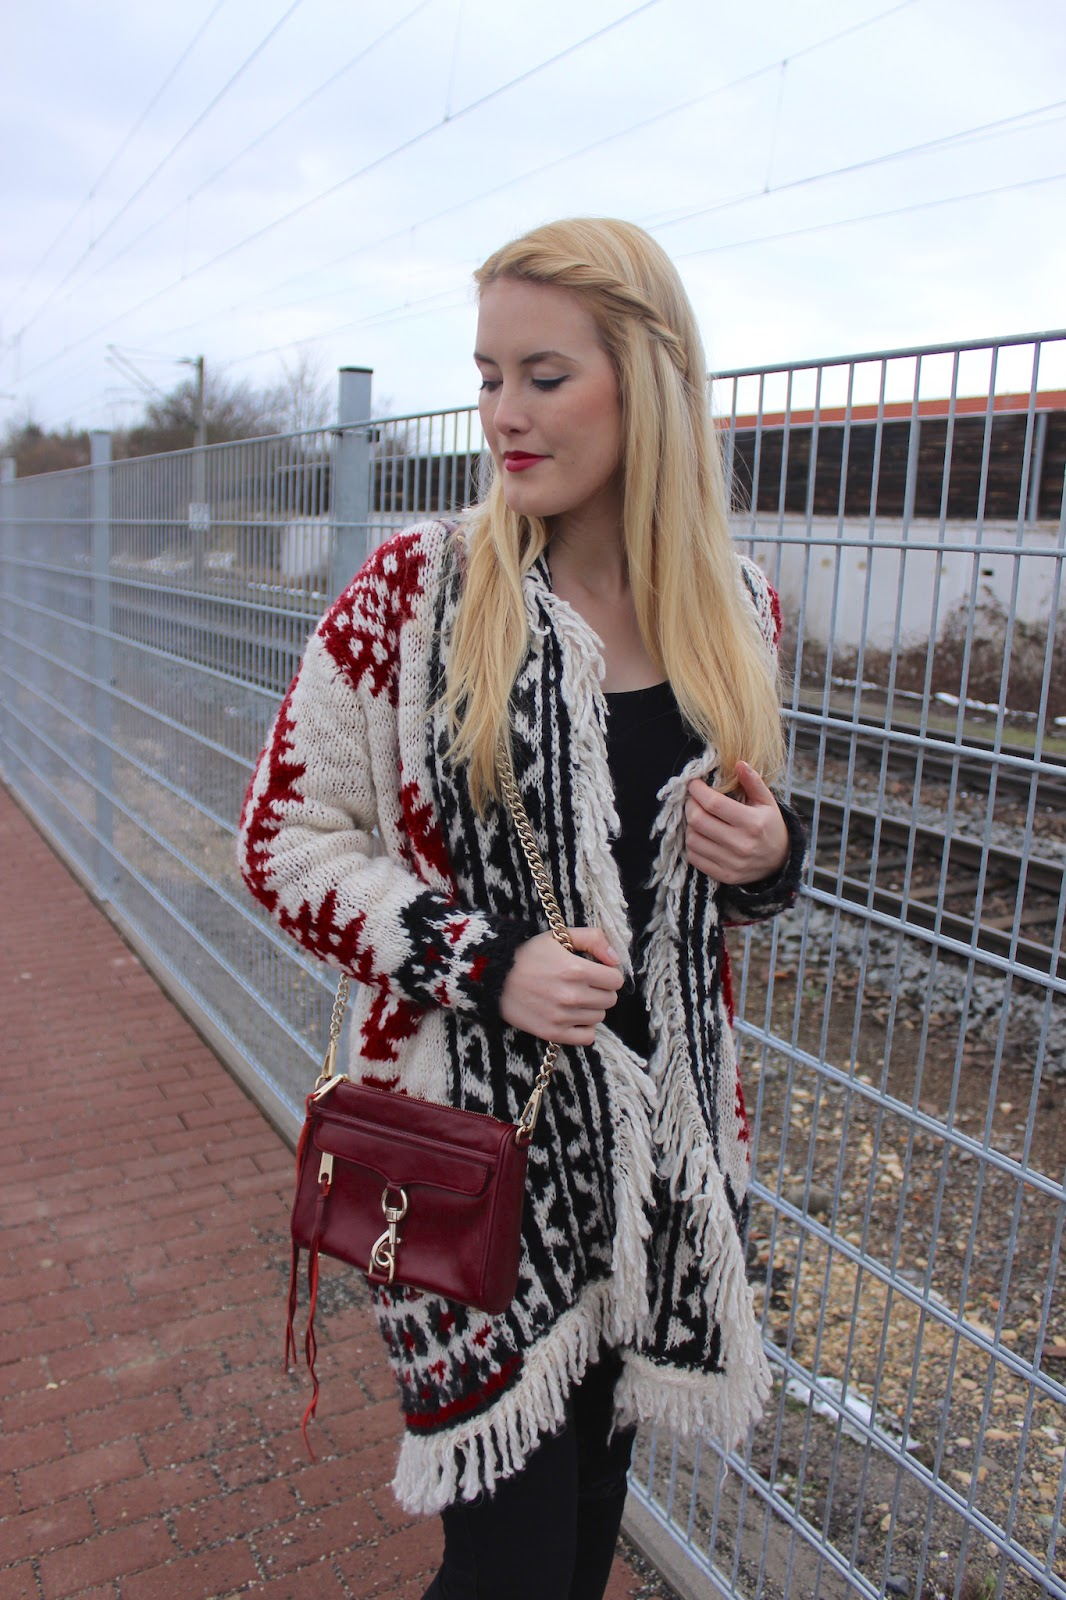 TheBlondeLion Outfit Isabel Marant Cardigan Strickcardigan Zara Ripped Jeans Rebecca Minkoff Mini Mac